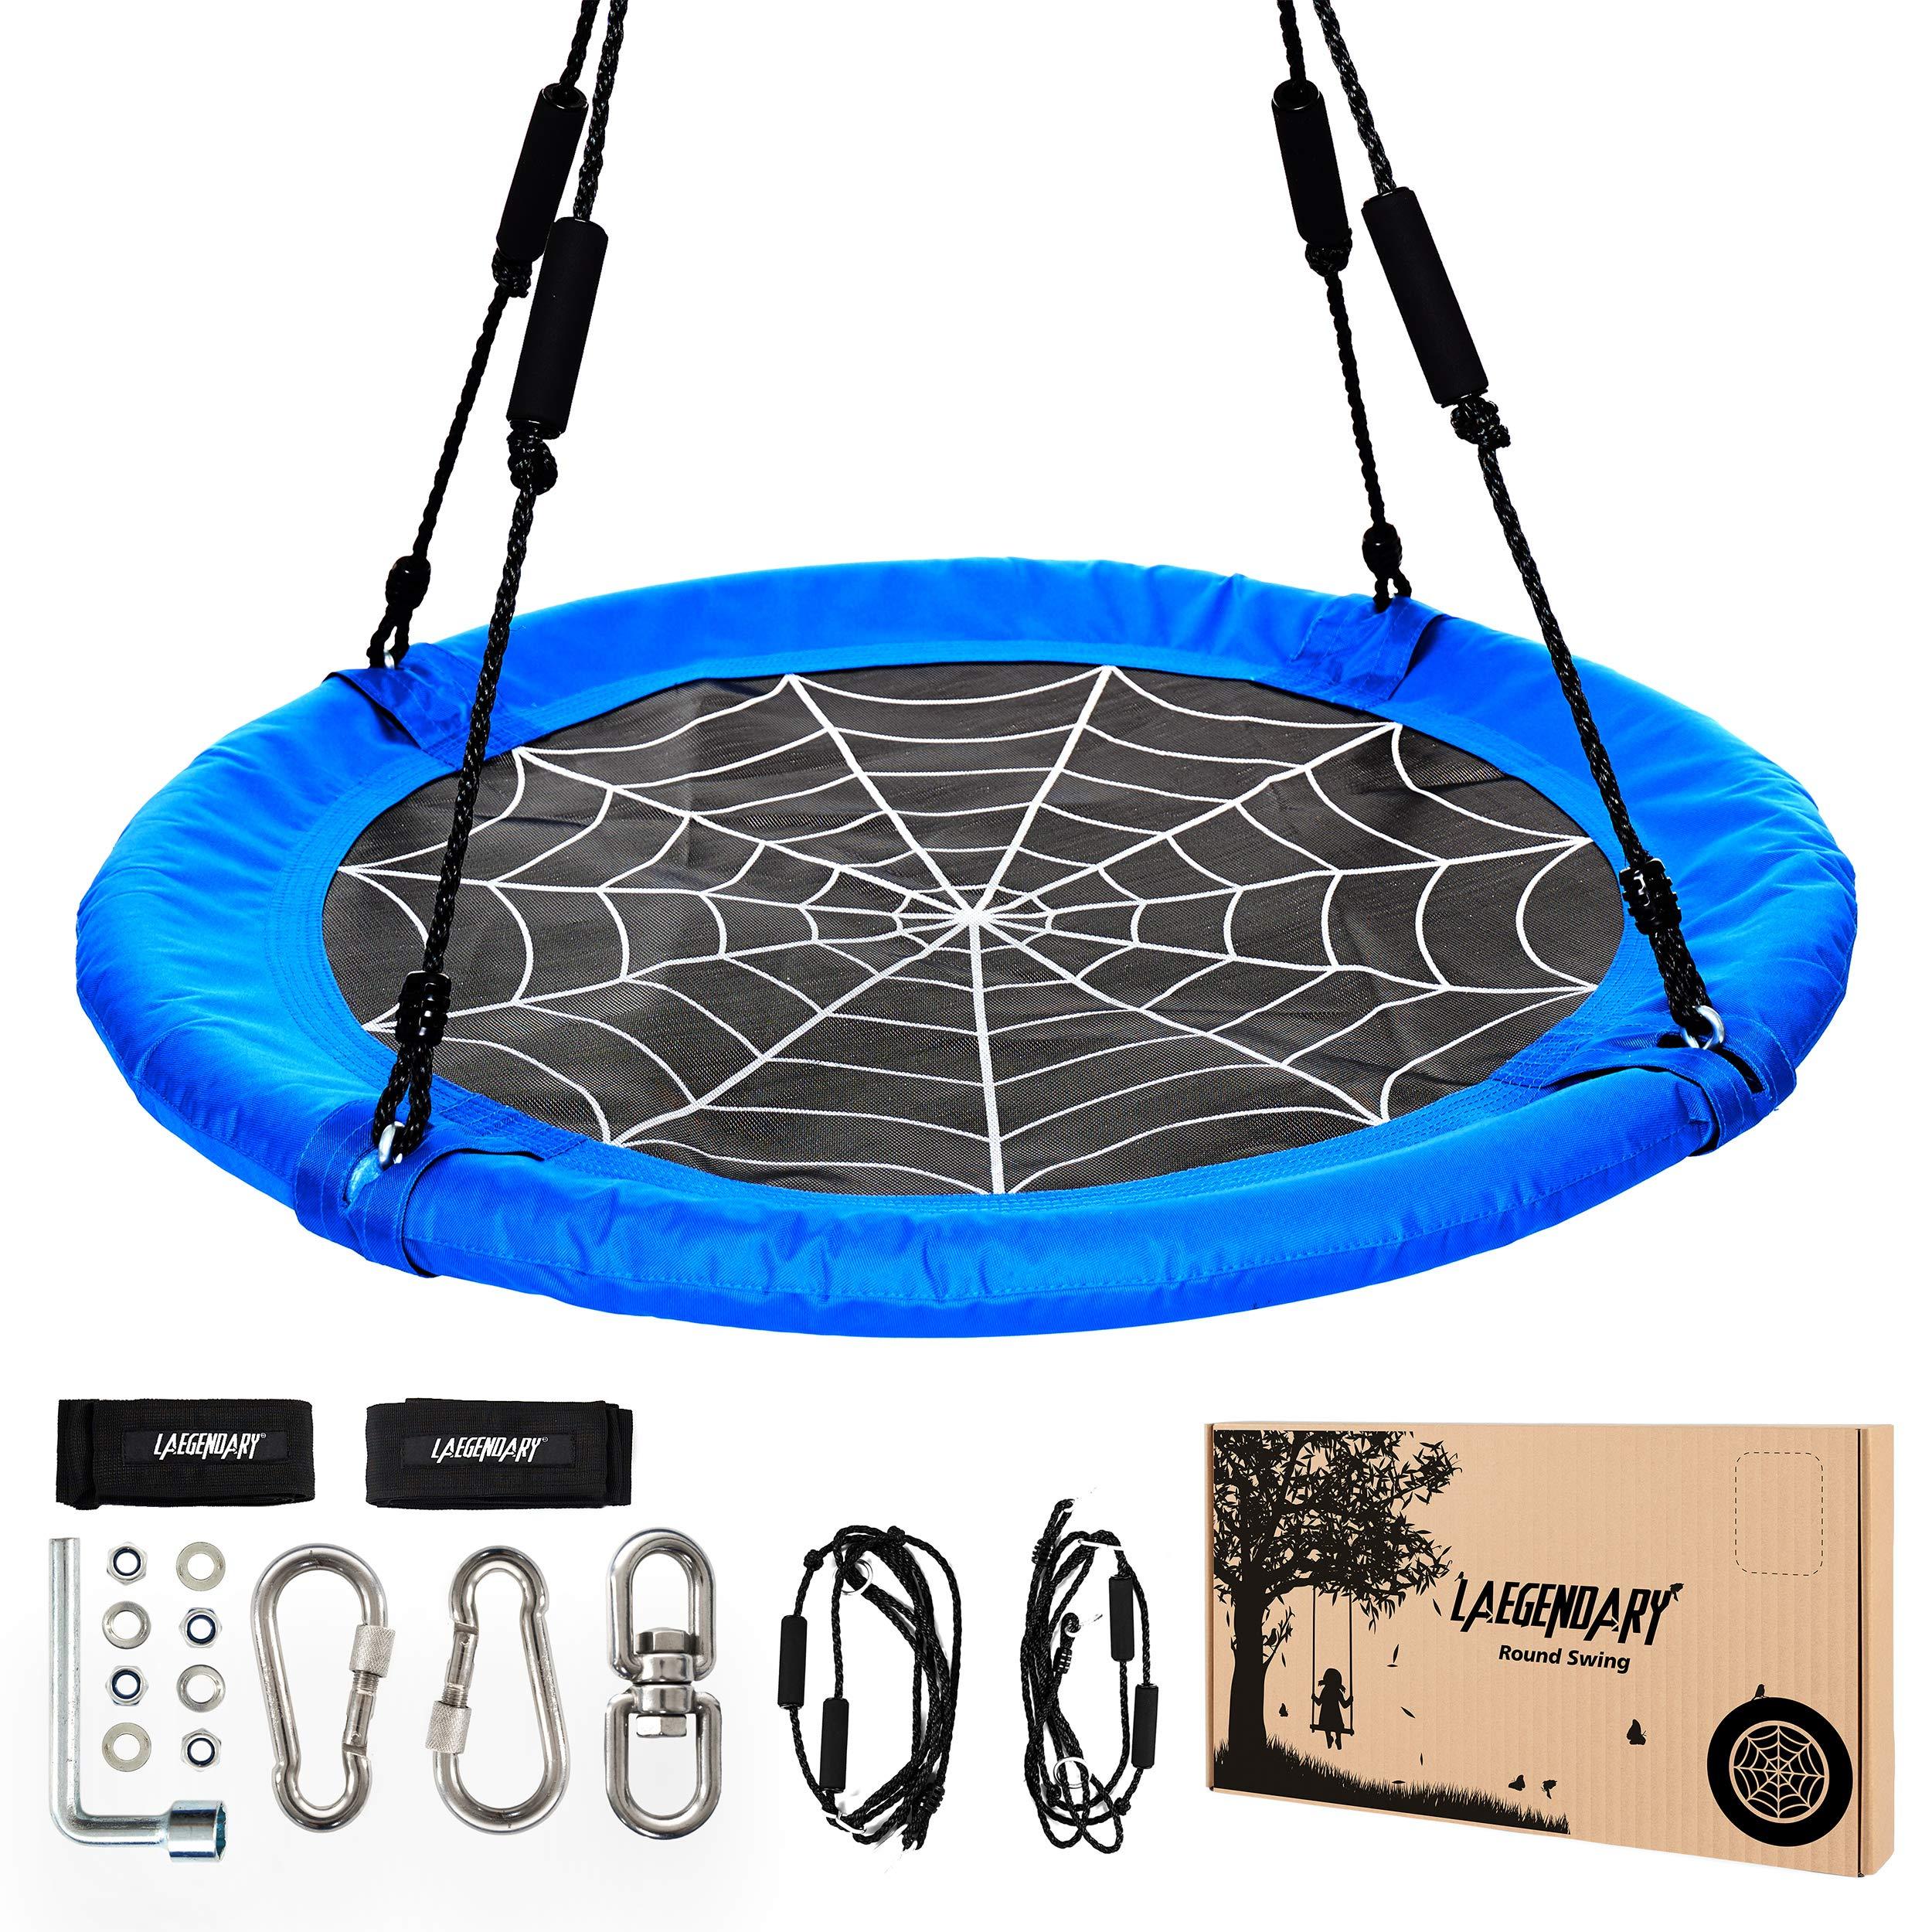 450 Pounds Sensory Web Tire Swings Durable Frame 40 Inch Flying Saucer Tree Swing for Kids 2 Carabiners 1 Swivel Waterproof Yard Swings Set Round Indoor Outdoor Swingset Toys 2 Tree Straps